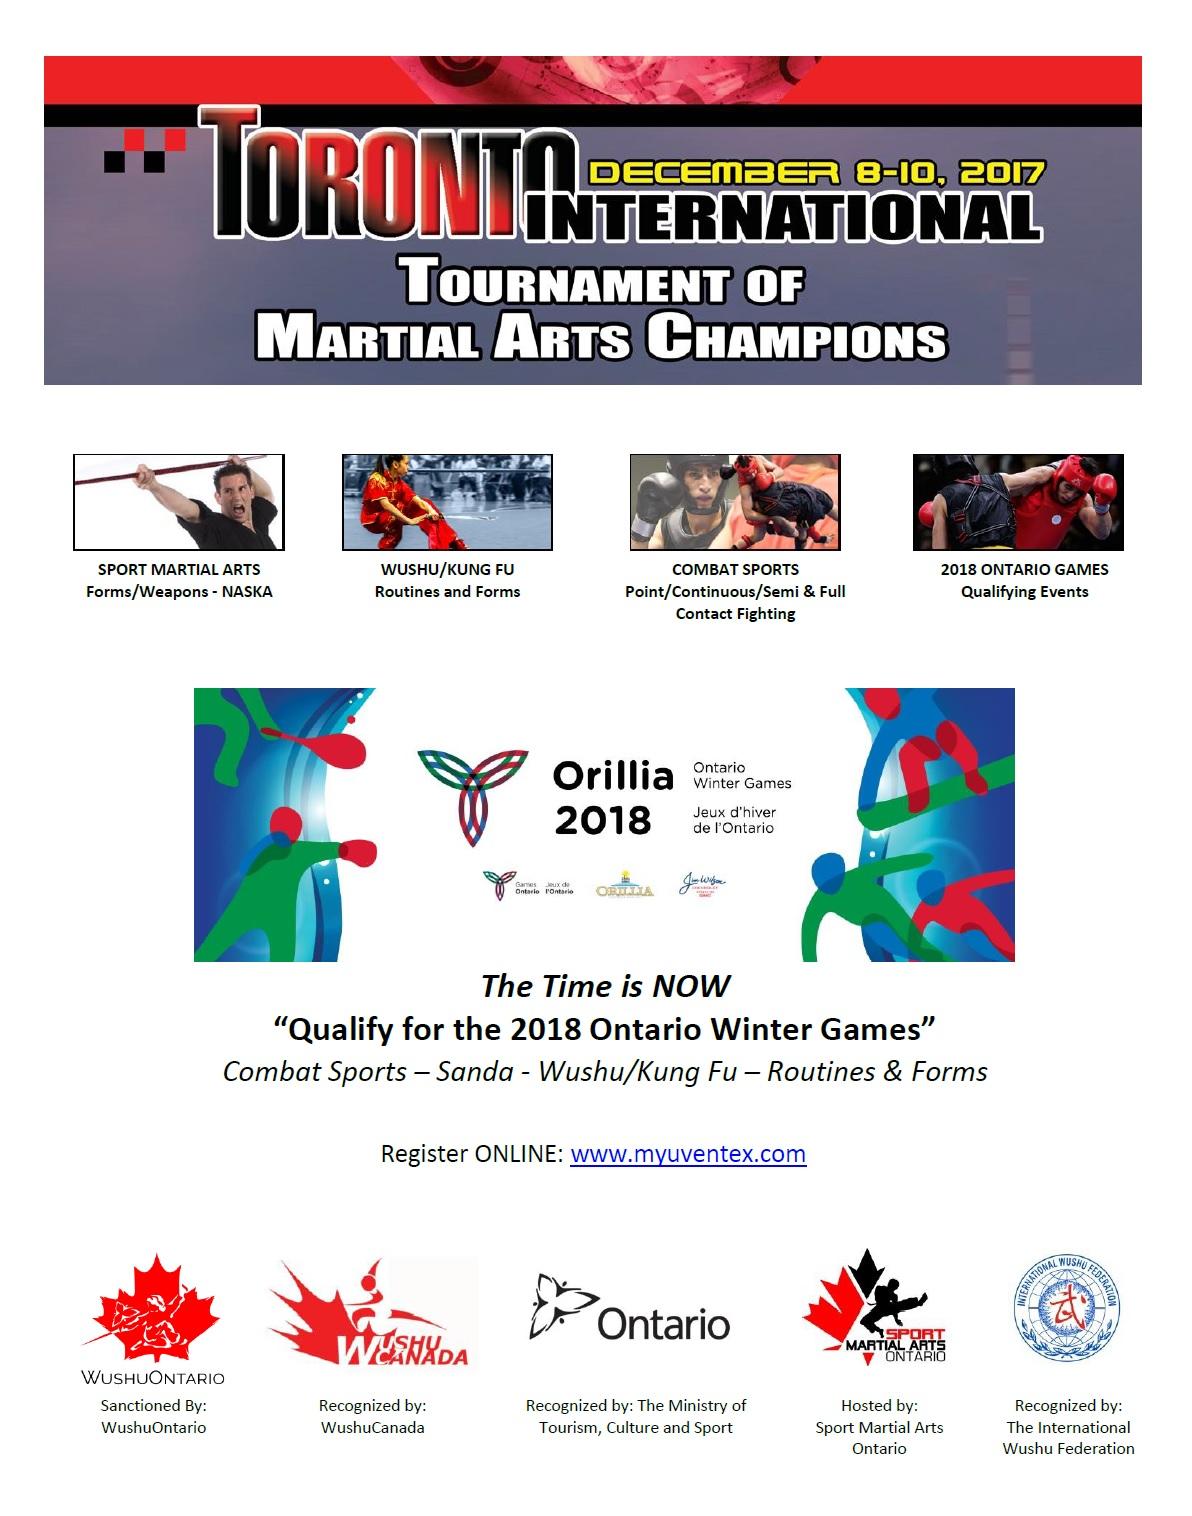 wushu-canada-ontario-toronto-international-tournament-of-martial-arts-champions-dec-2017.jpg